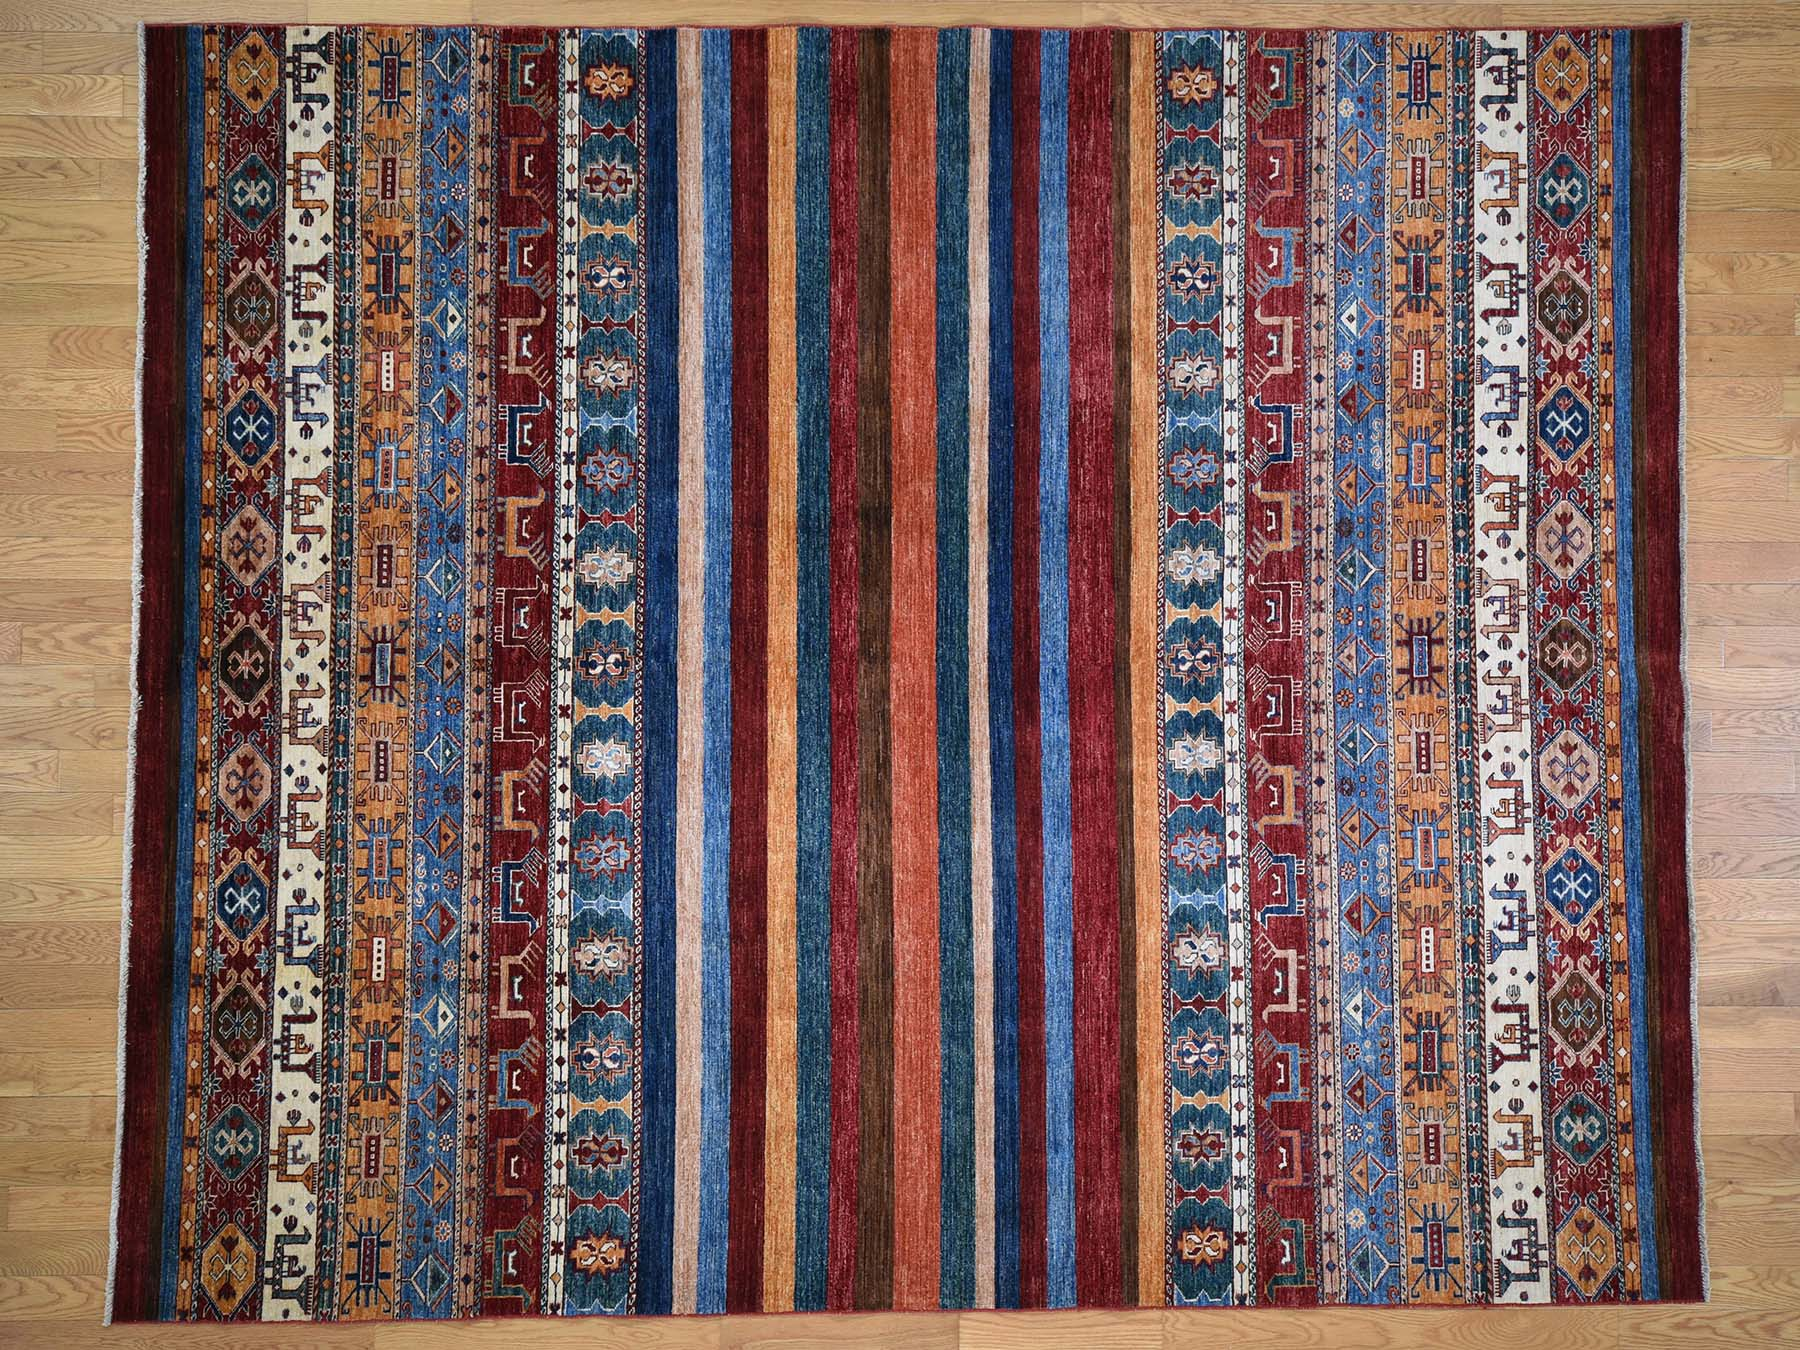 8 3 X10 Super Kazak Khorjin Design Hand Knotted Pure Wool Rug